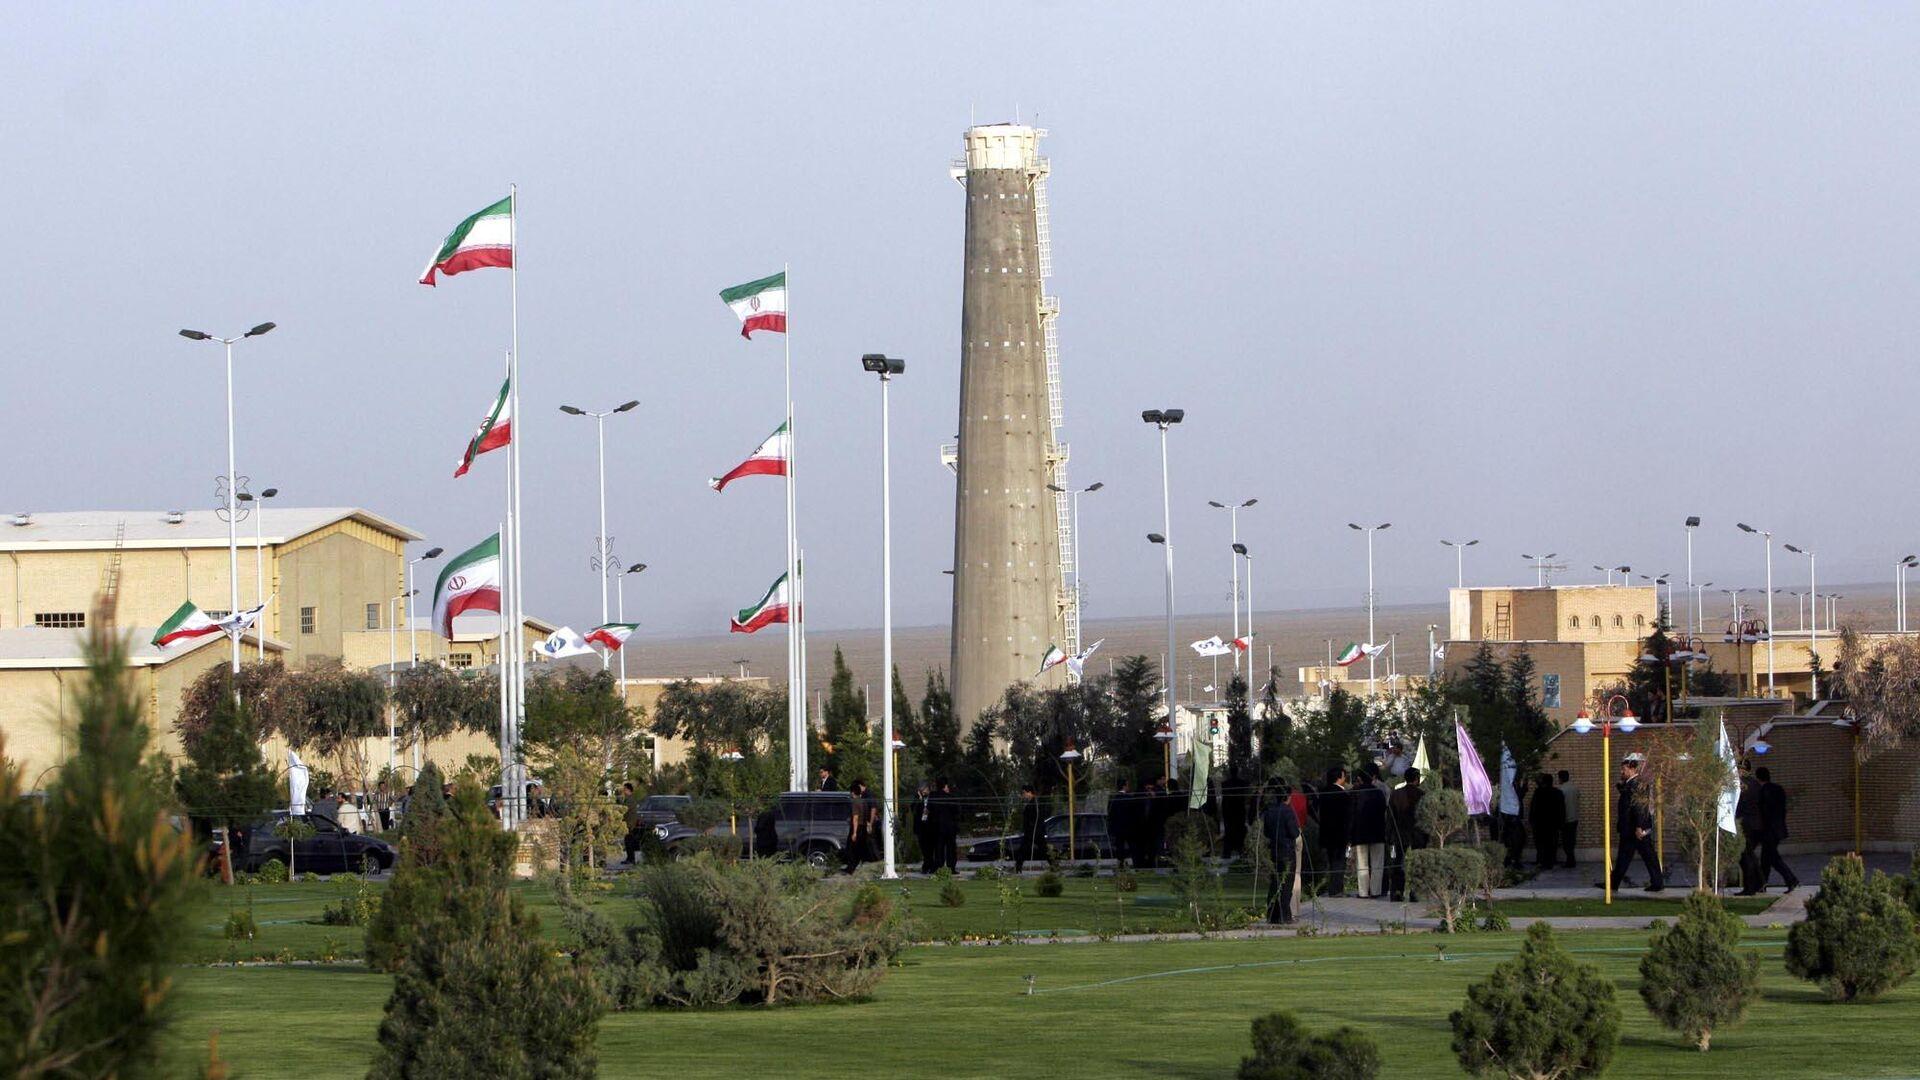 Planta iraní de enriquecimiento de uranio en Natanz - Sputnik Mundo, 1920, 17.04.2021